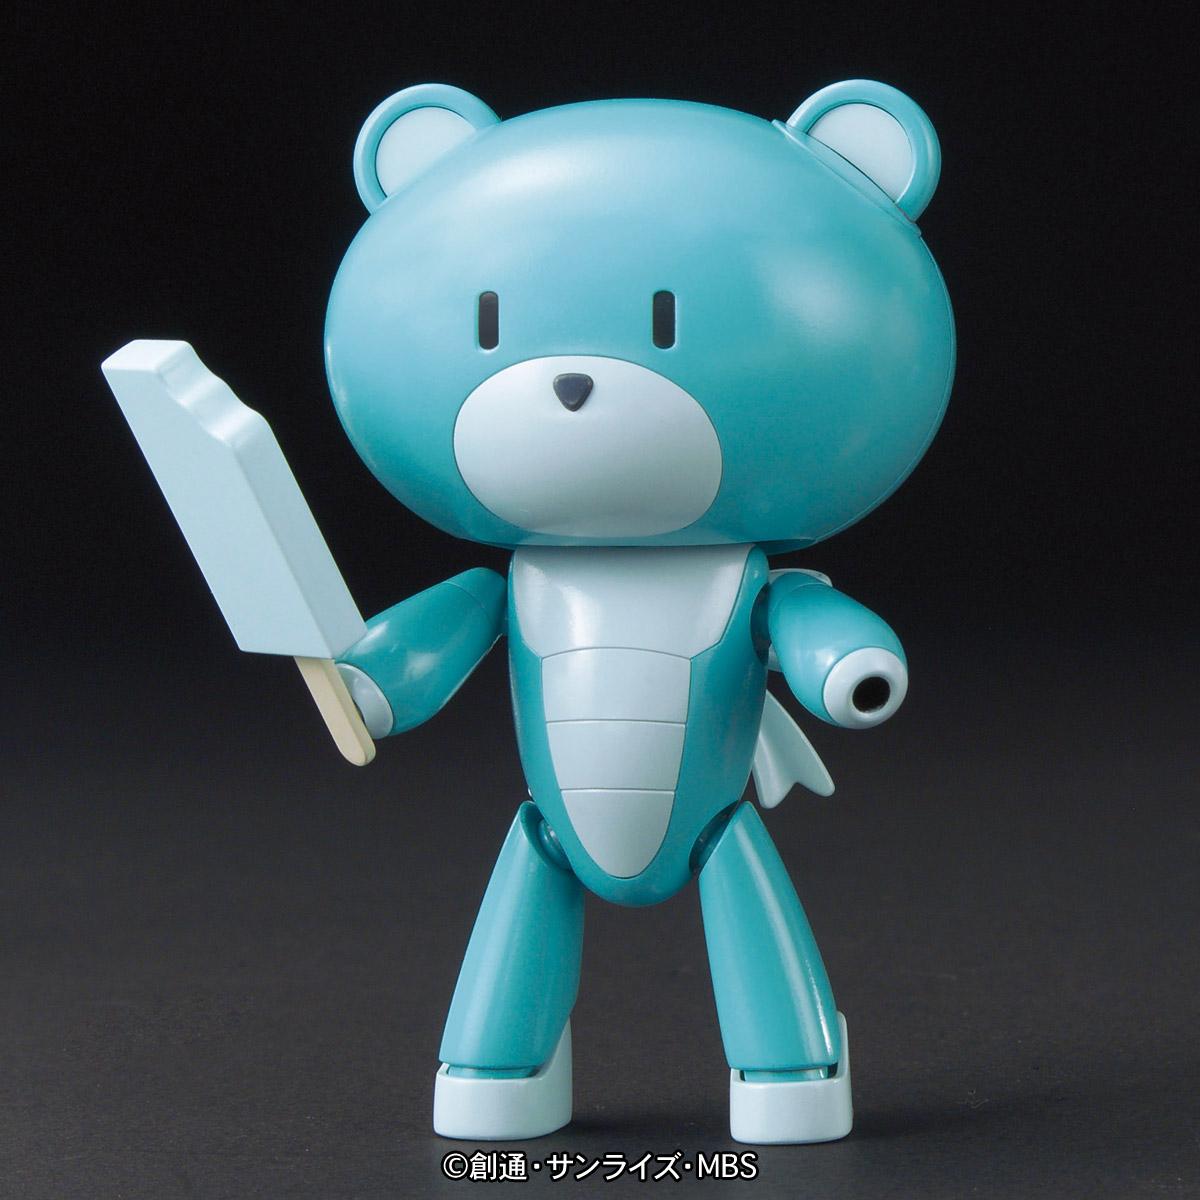 38071HGPG 1/144 プチッガイ ソーダポップブルー&アイスキャンディ [Petit'gguy Sodapop Blue and Ice Candy]